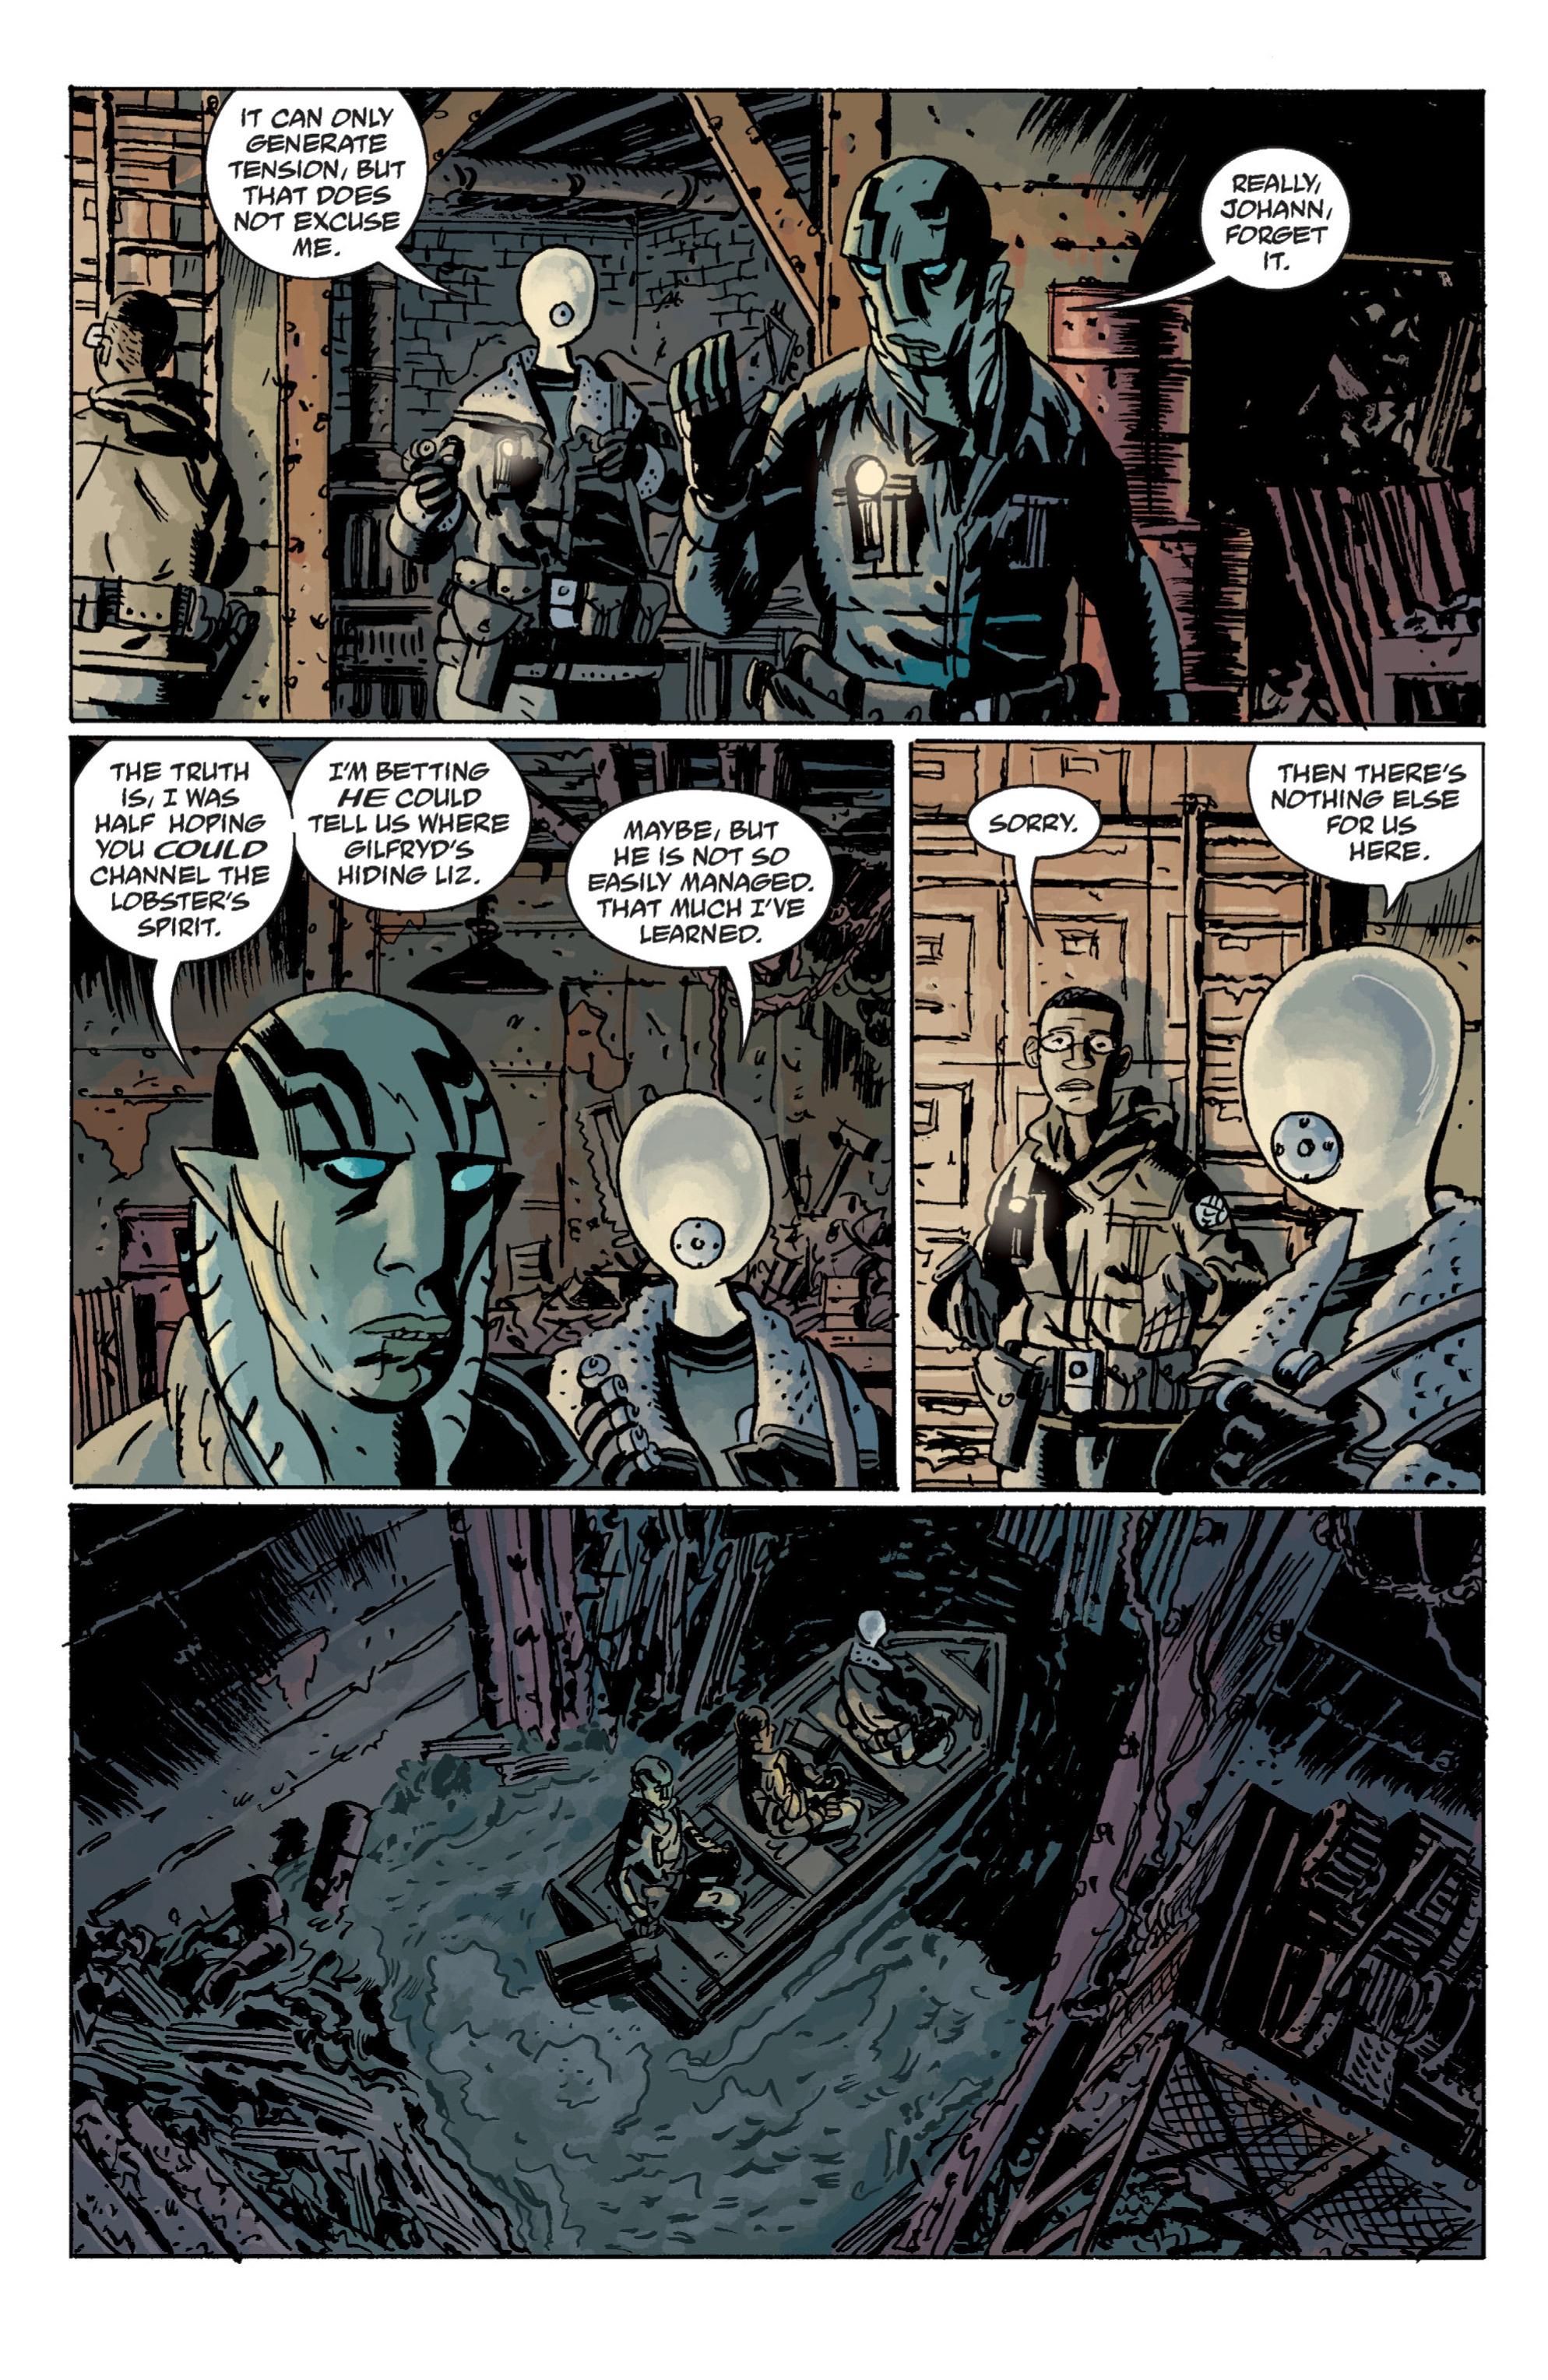 Read online B.P.R.D. (2003) comic -  Issue # TPB 11 - 30